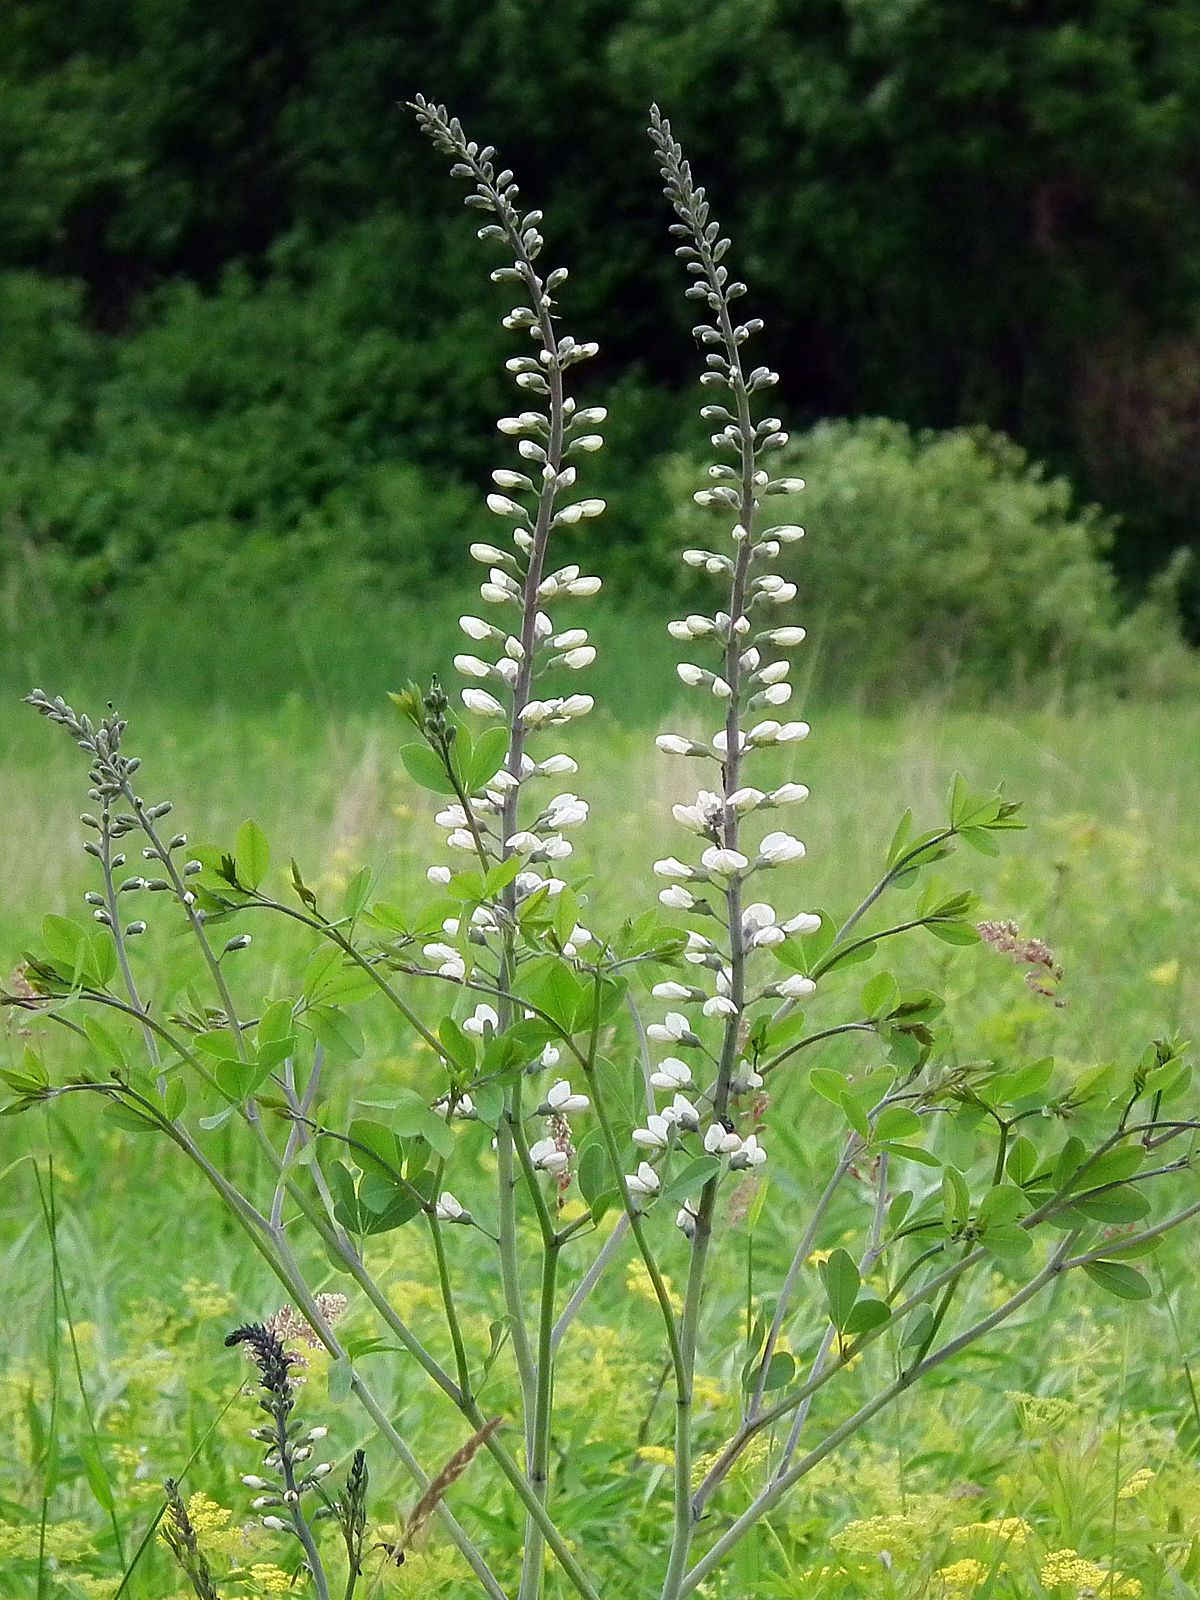 alba baptisia indigo wild native plants flowering wikipedia mid var southern thick plant atlantic macrophylla perennial flower pod shrub lactea